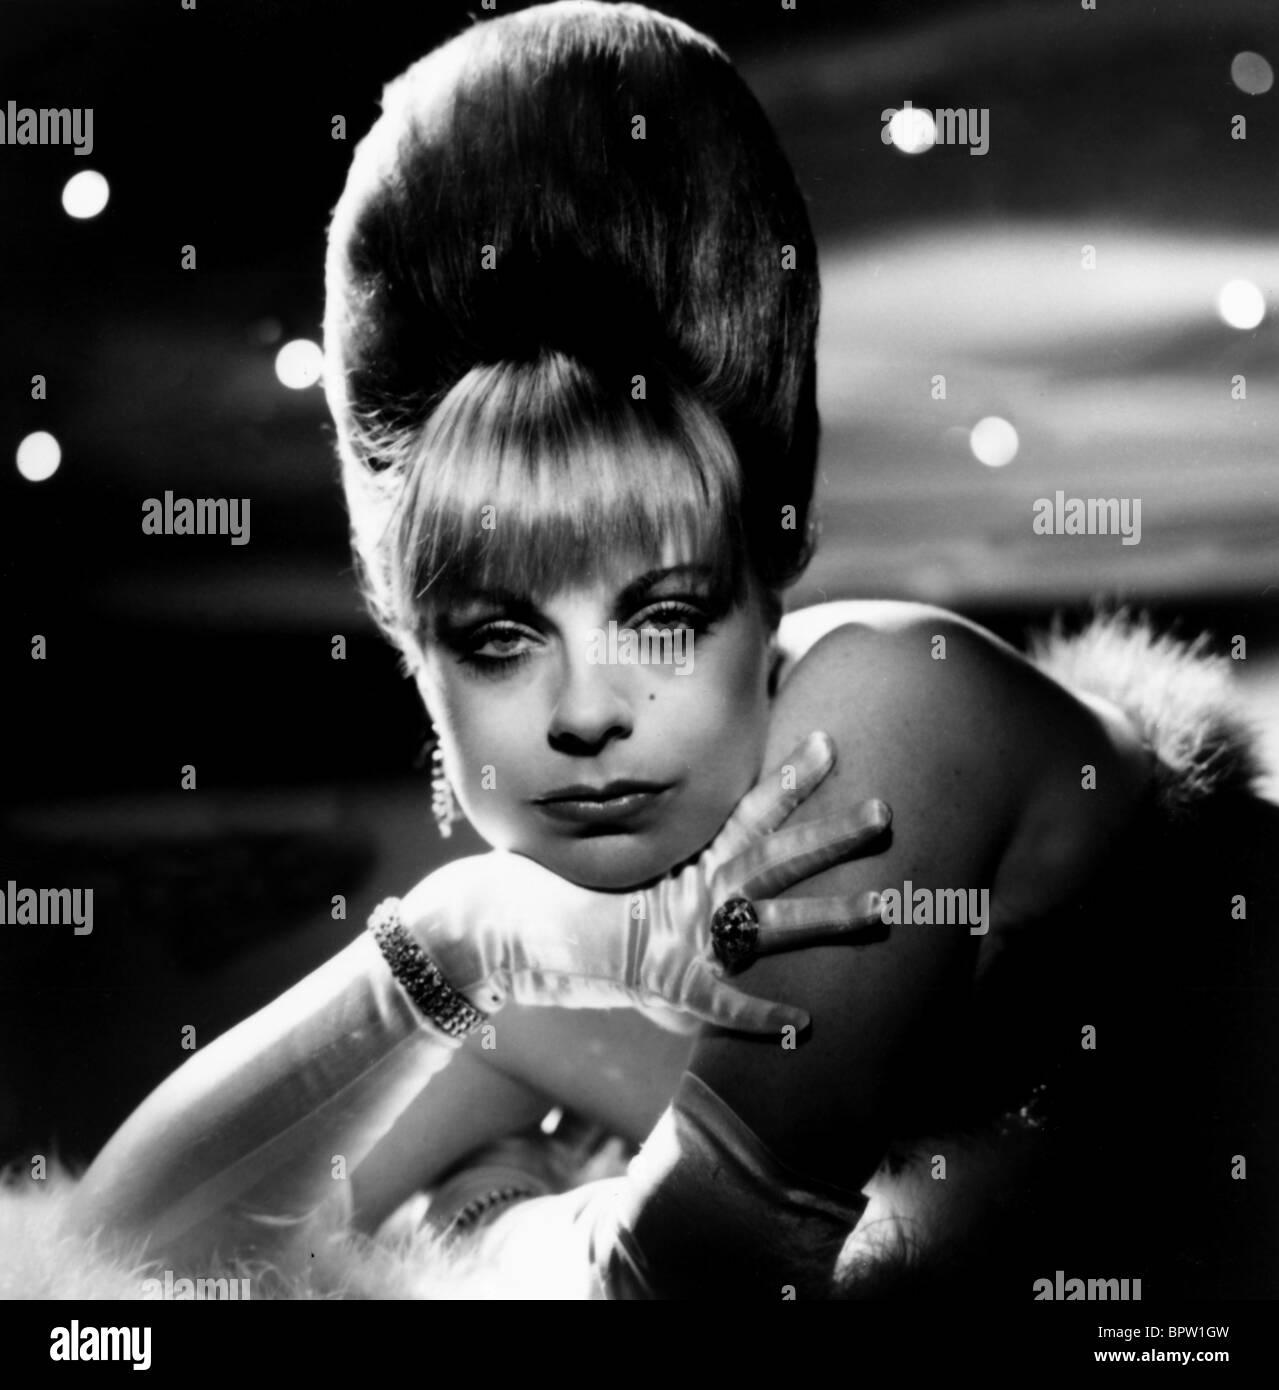 MARI WILSON SINGER (1984) - Stock Image